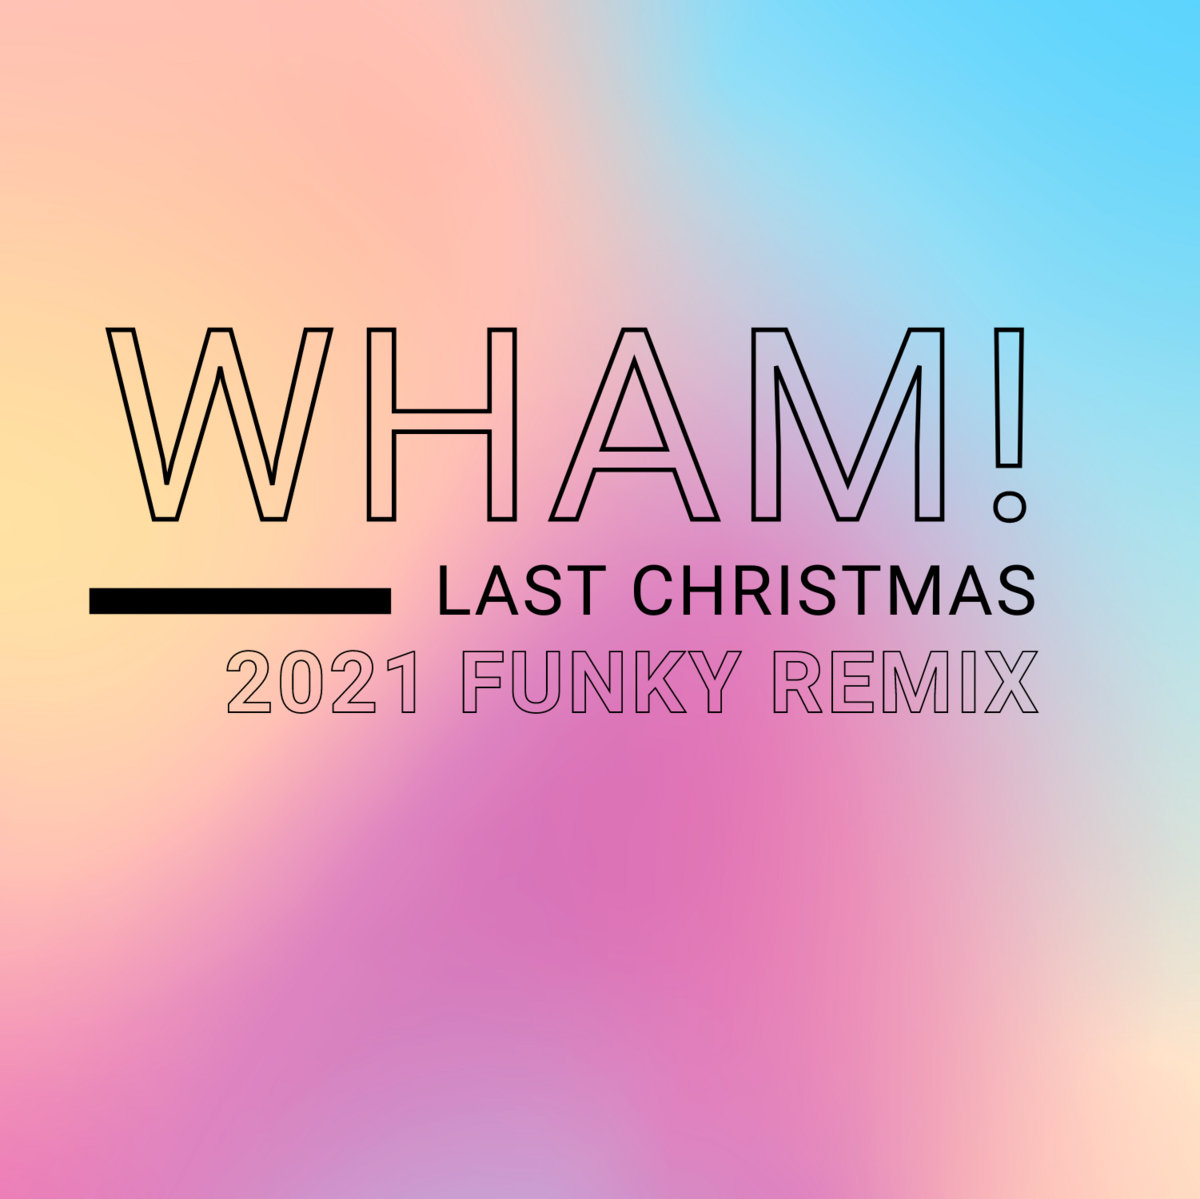 Last Christmas 2021 Wham Last Christmas 2021 Funky Remix Wham Last Christmas 2021 Funky Remix Dj Ivan Santana